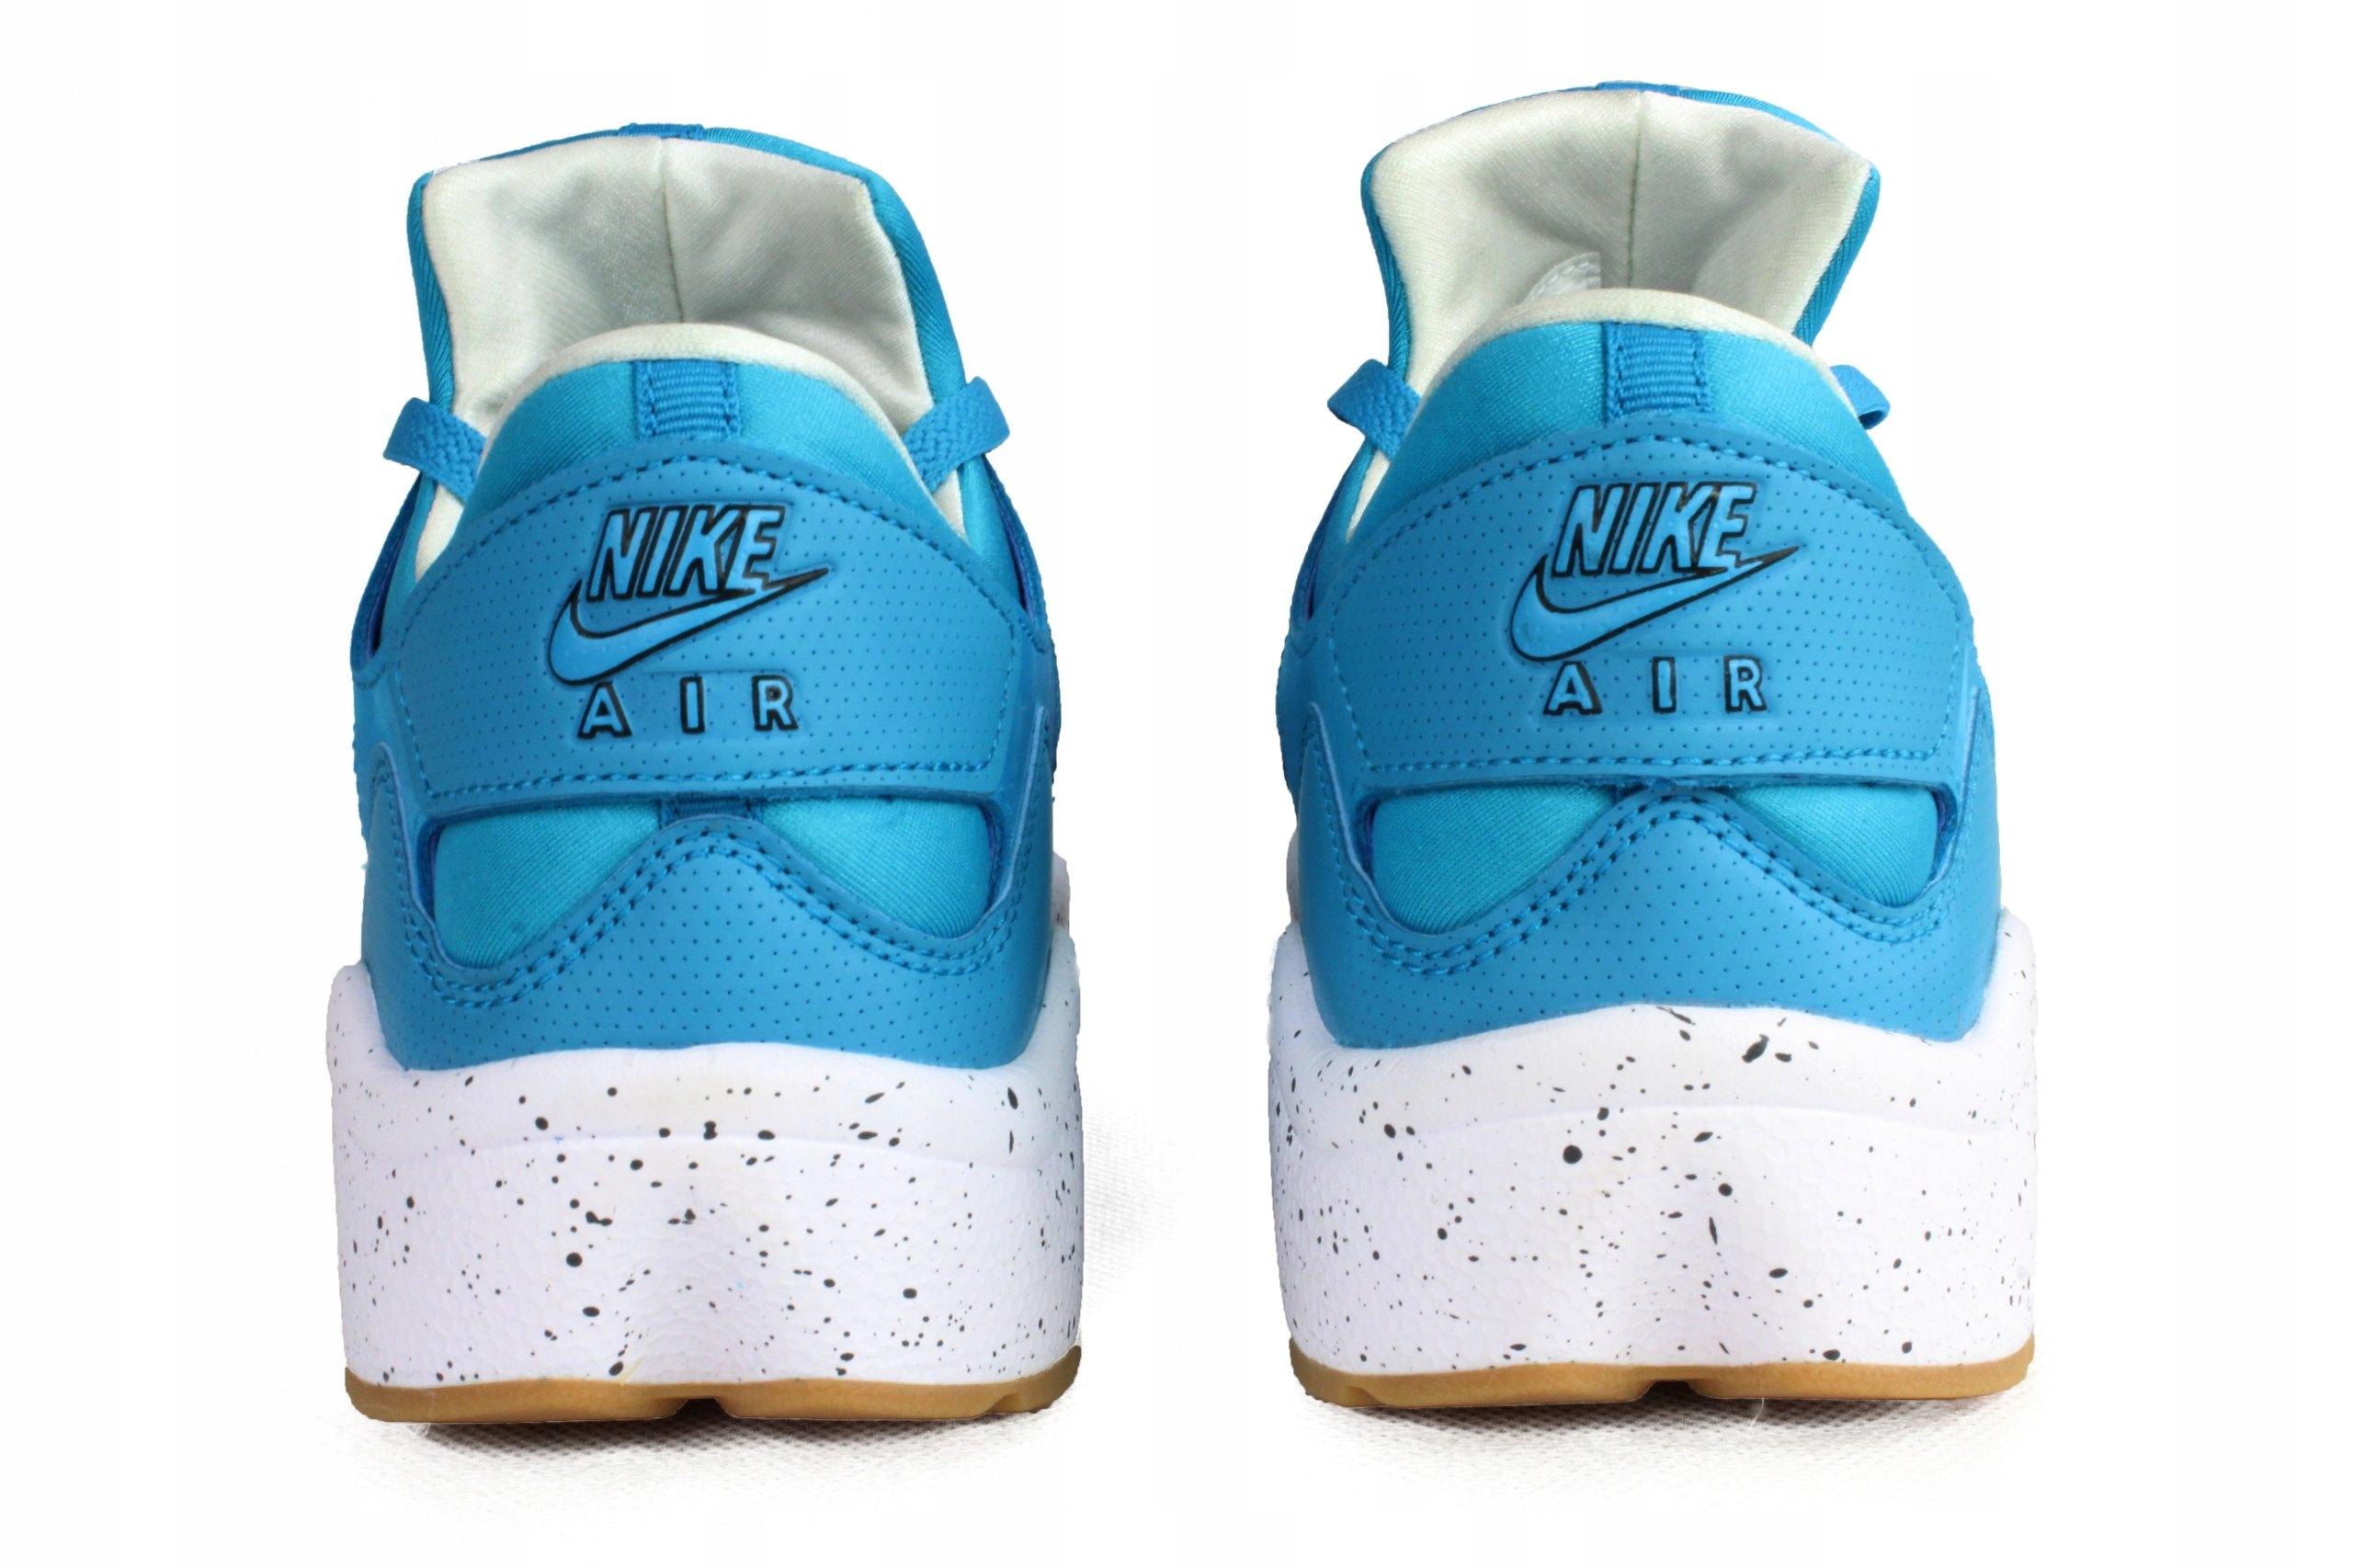 new products d5e5f 9f034 Buty Nike Air Huarache International Premium r. 42 (7098789162)